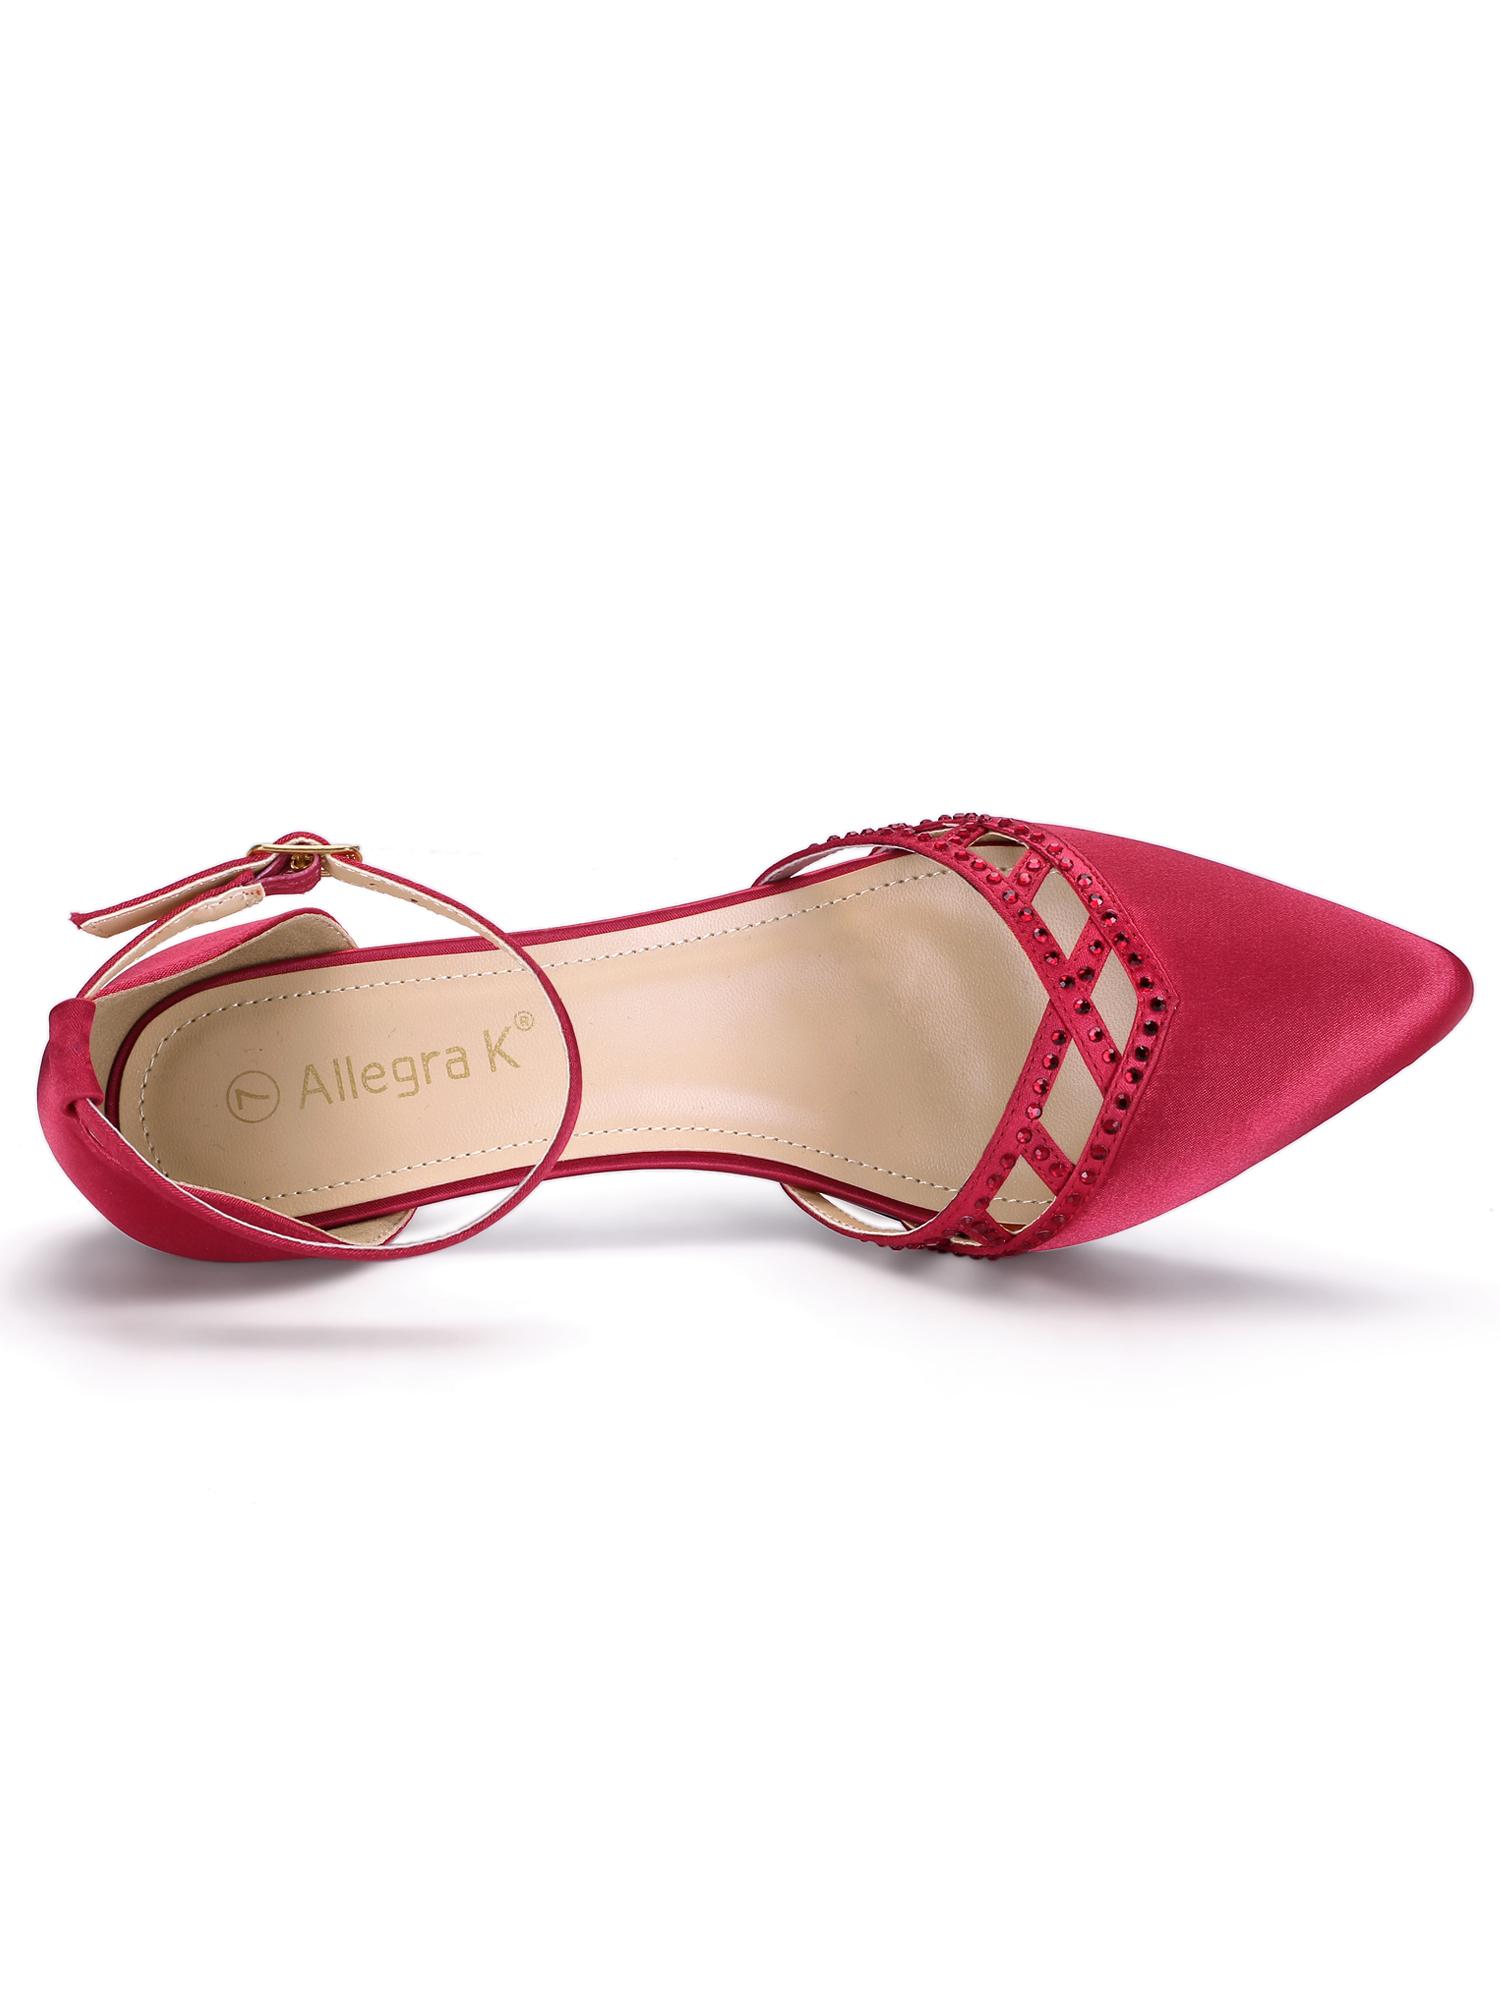 Women's Kitten Heel Ankle Strap Rhinestone Pumps Sandals Red (Size 6)